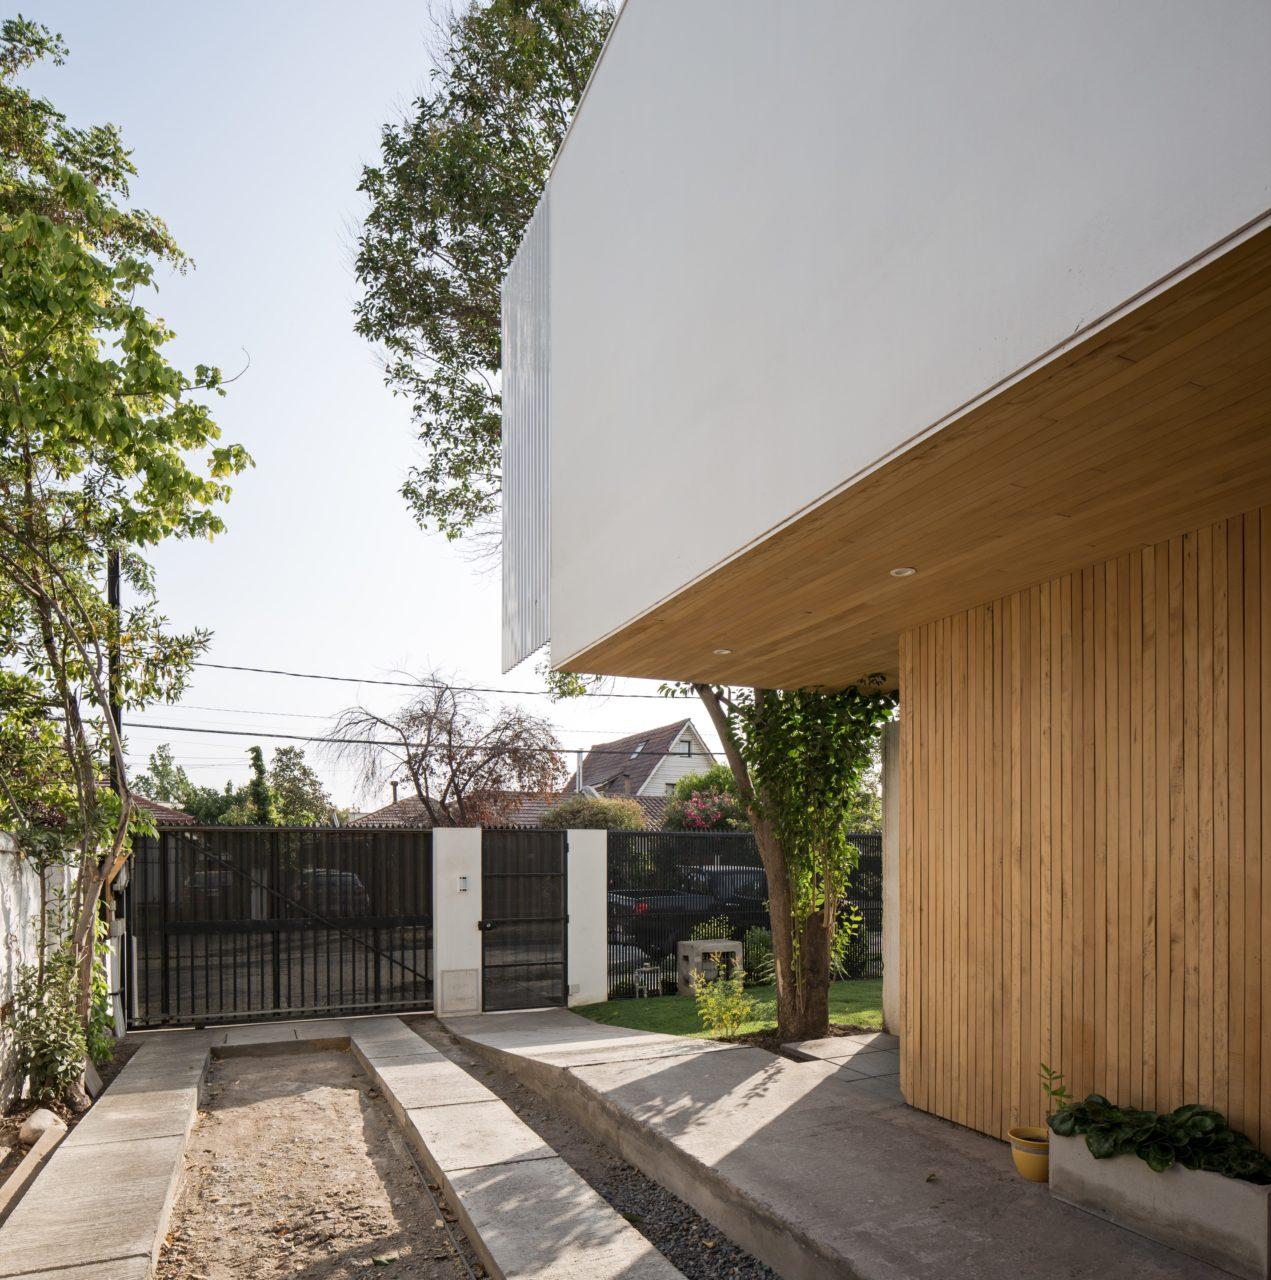 Rey Cristian House by GITC